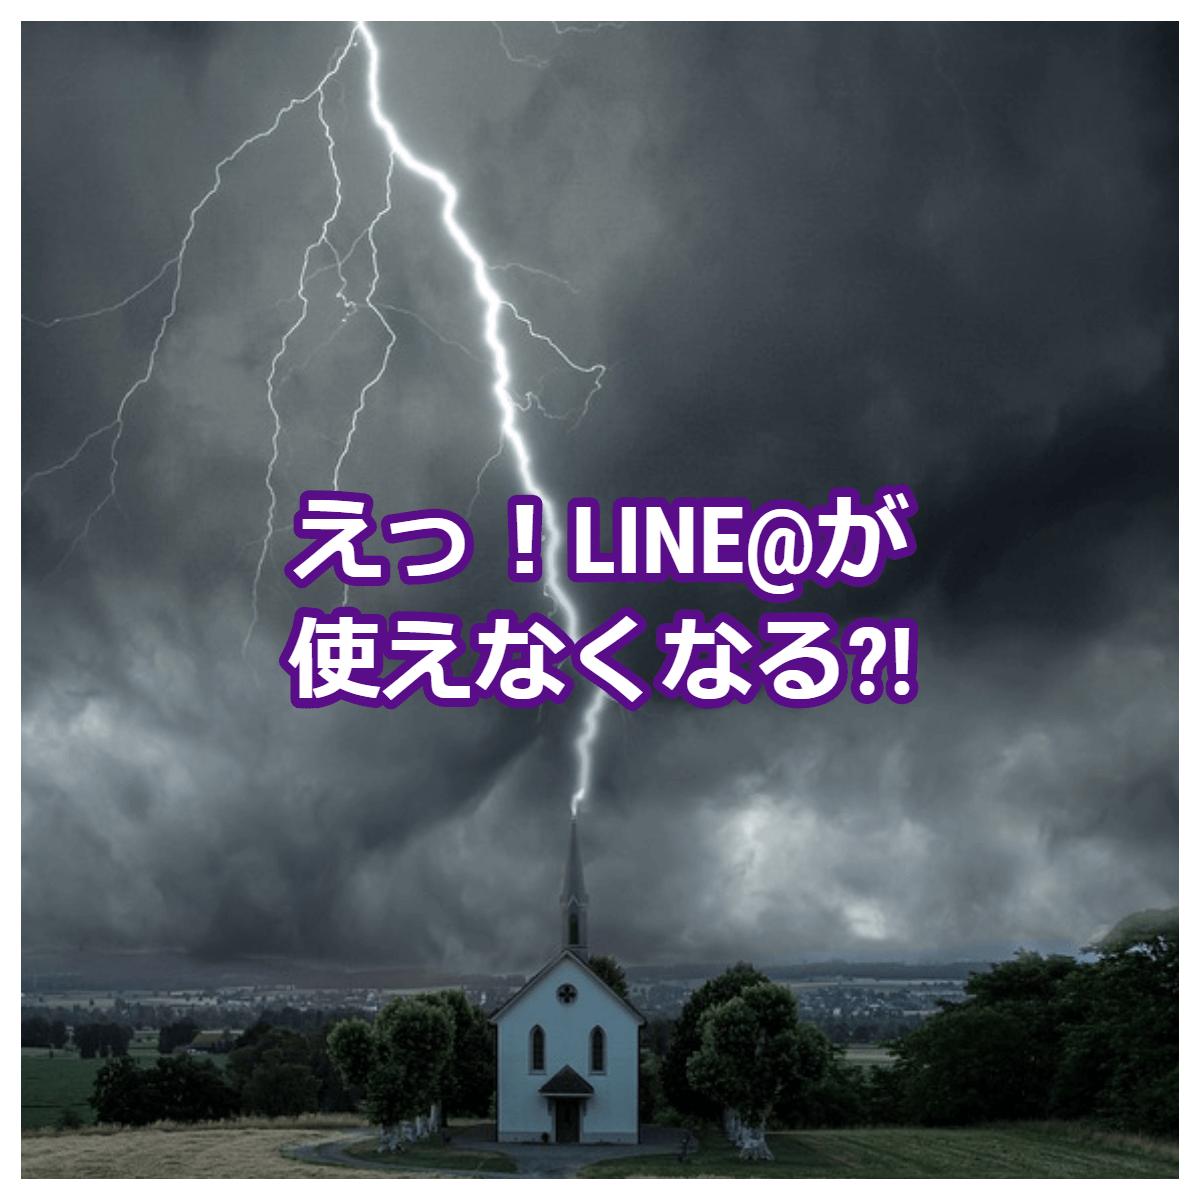 f:id:lamourinfini:20191116160826p:plain